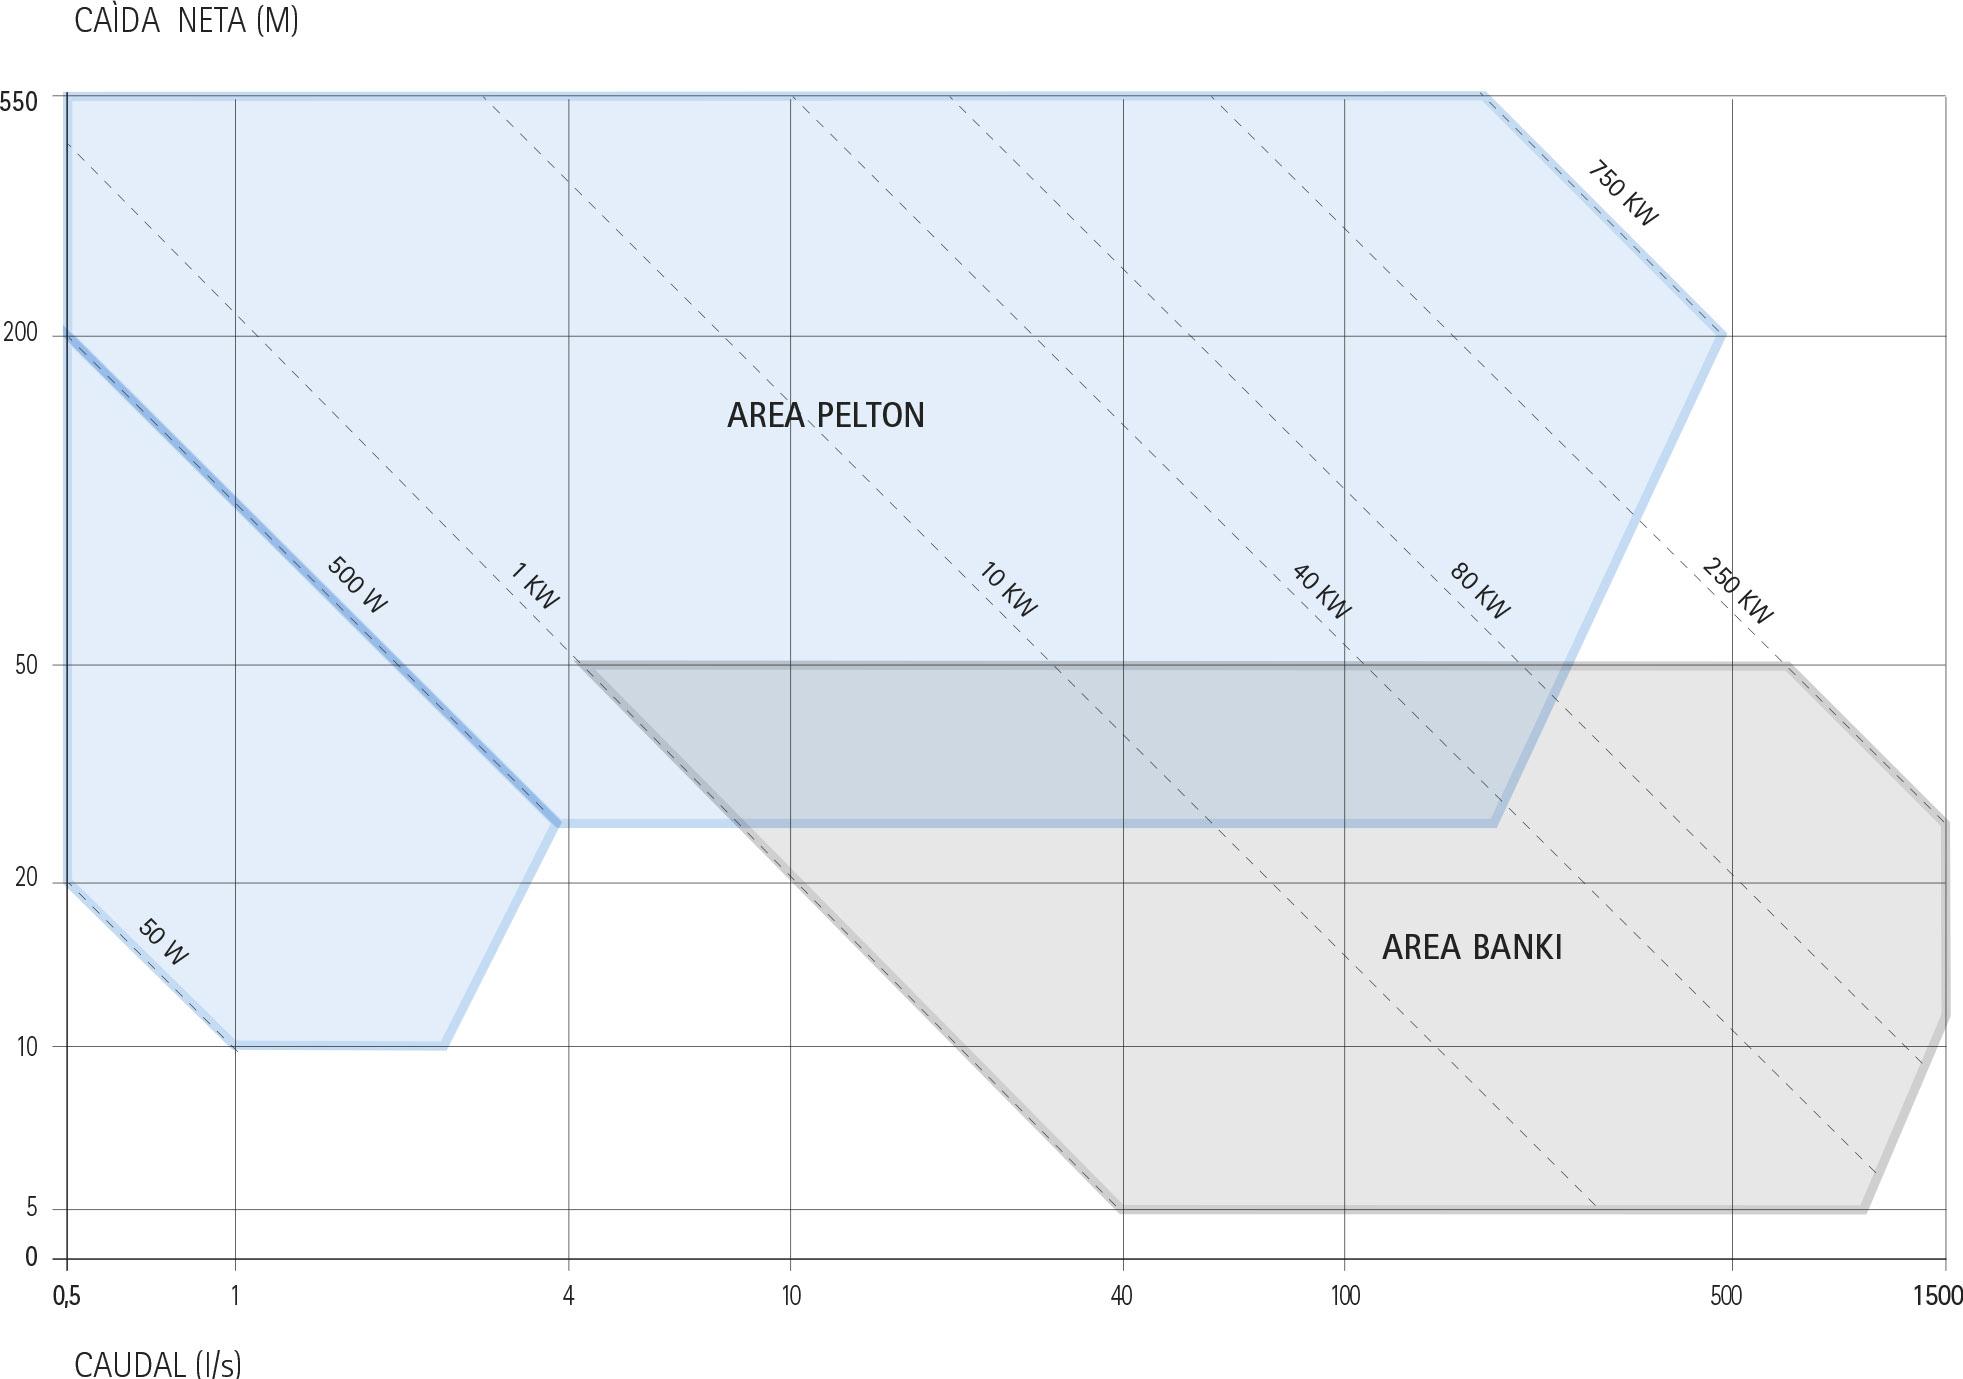 gama de potencia agua potable EN PARALELO A LA RED ECOWATT HYDRO TPS - TBS